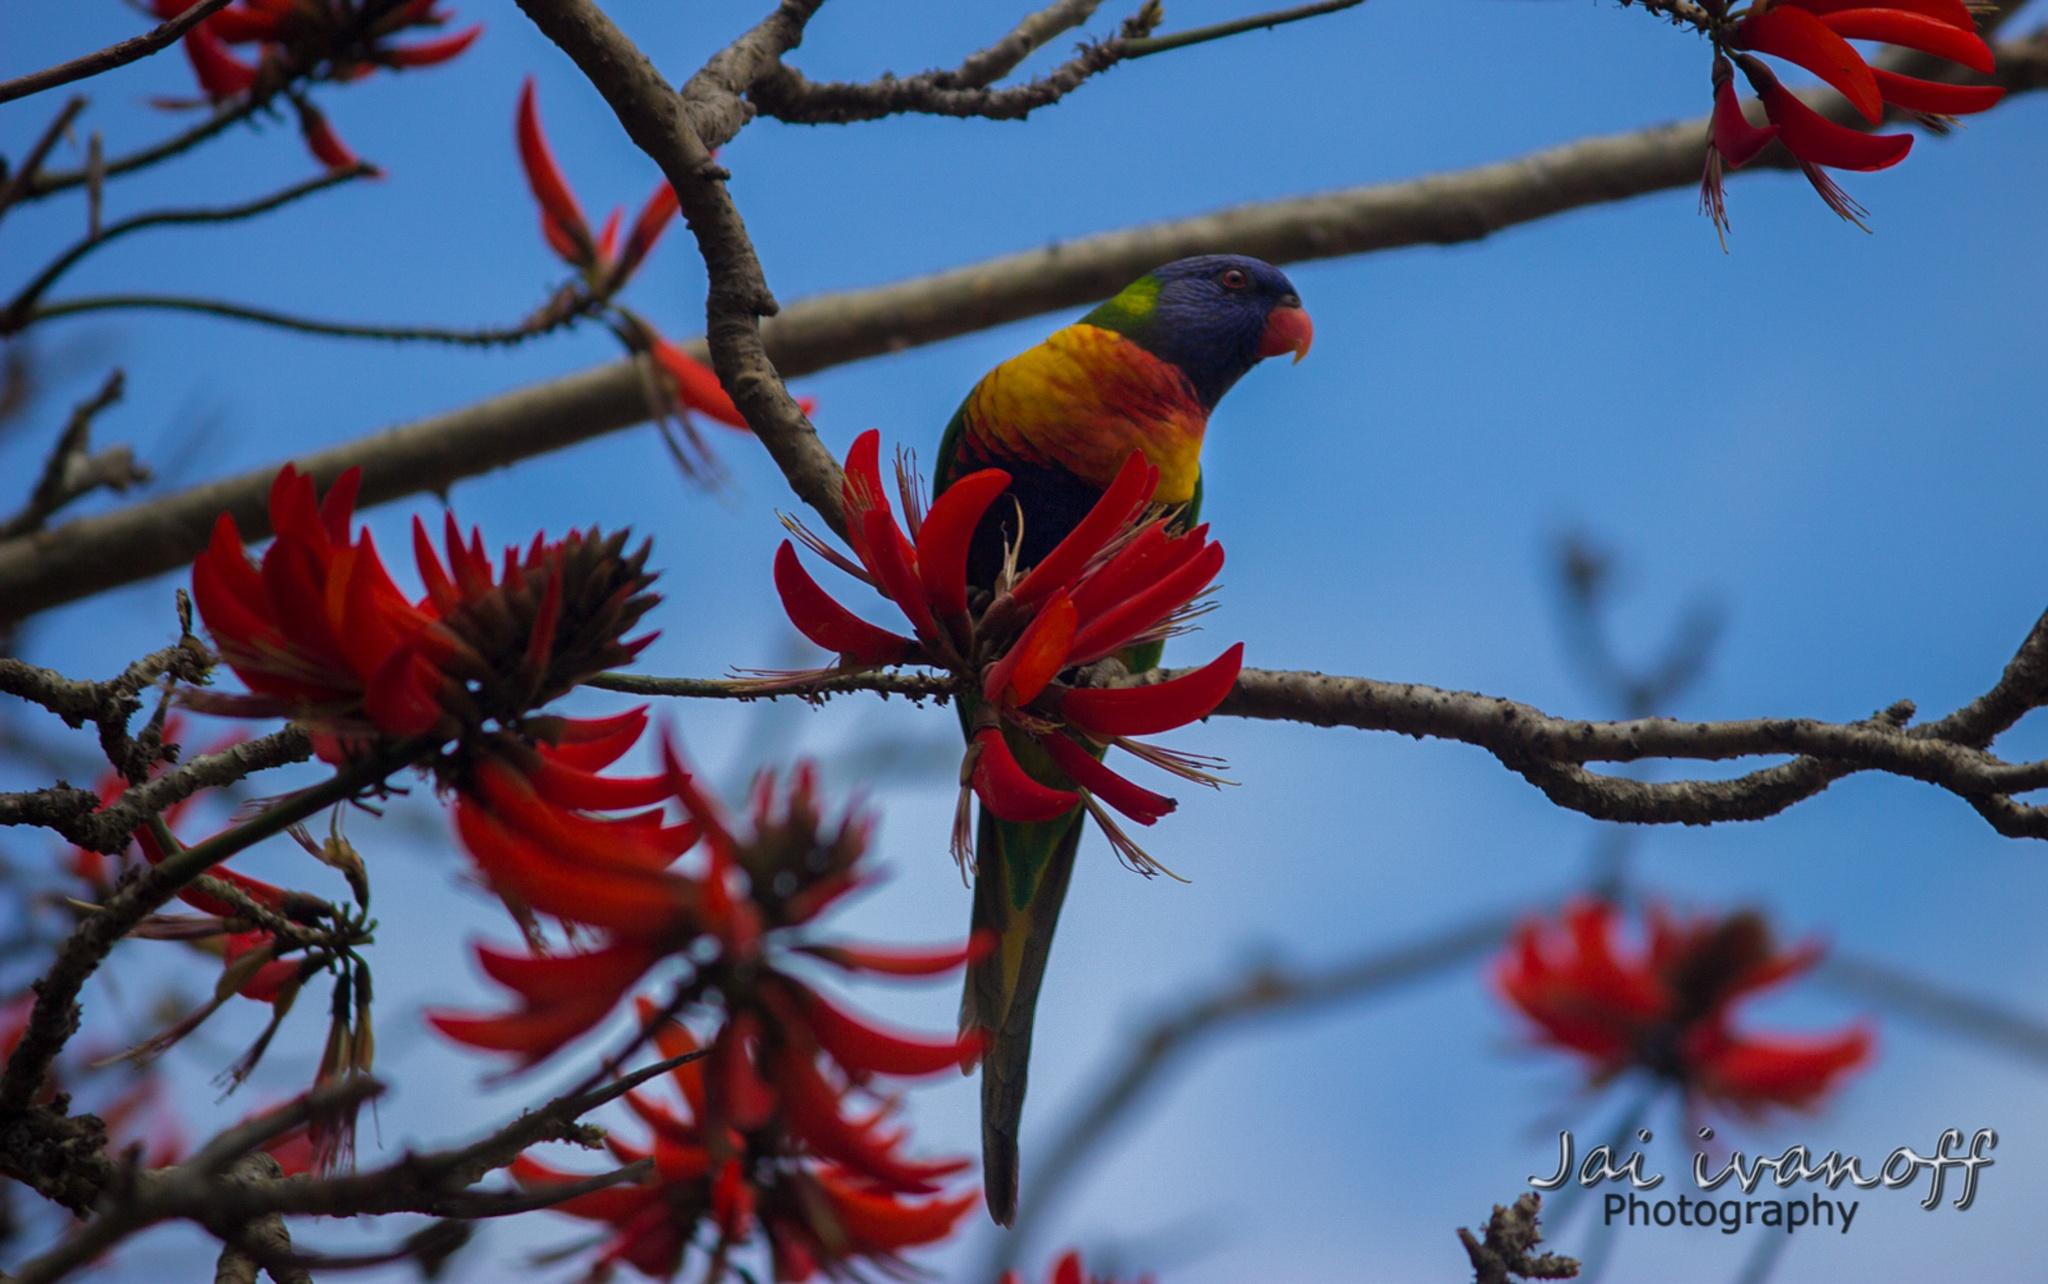 rainbow lorikeet by Jai Ivanoff